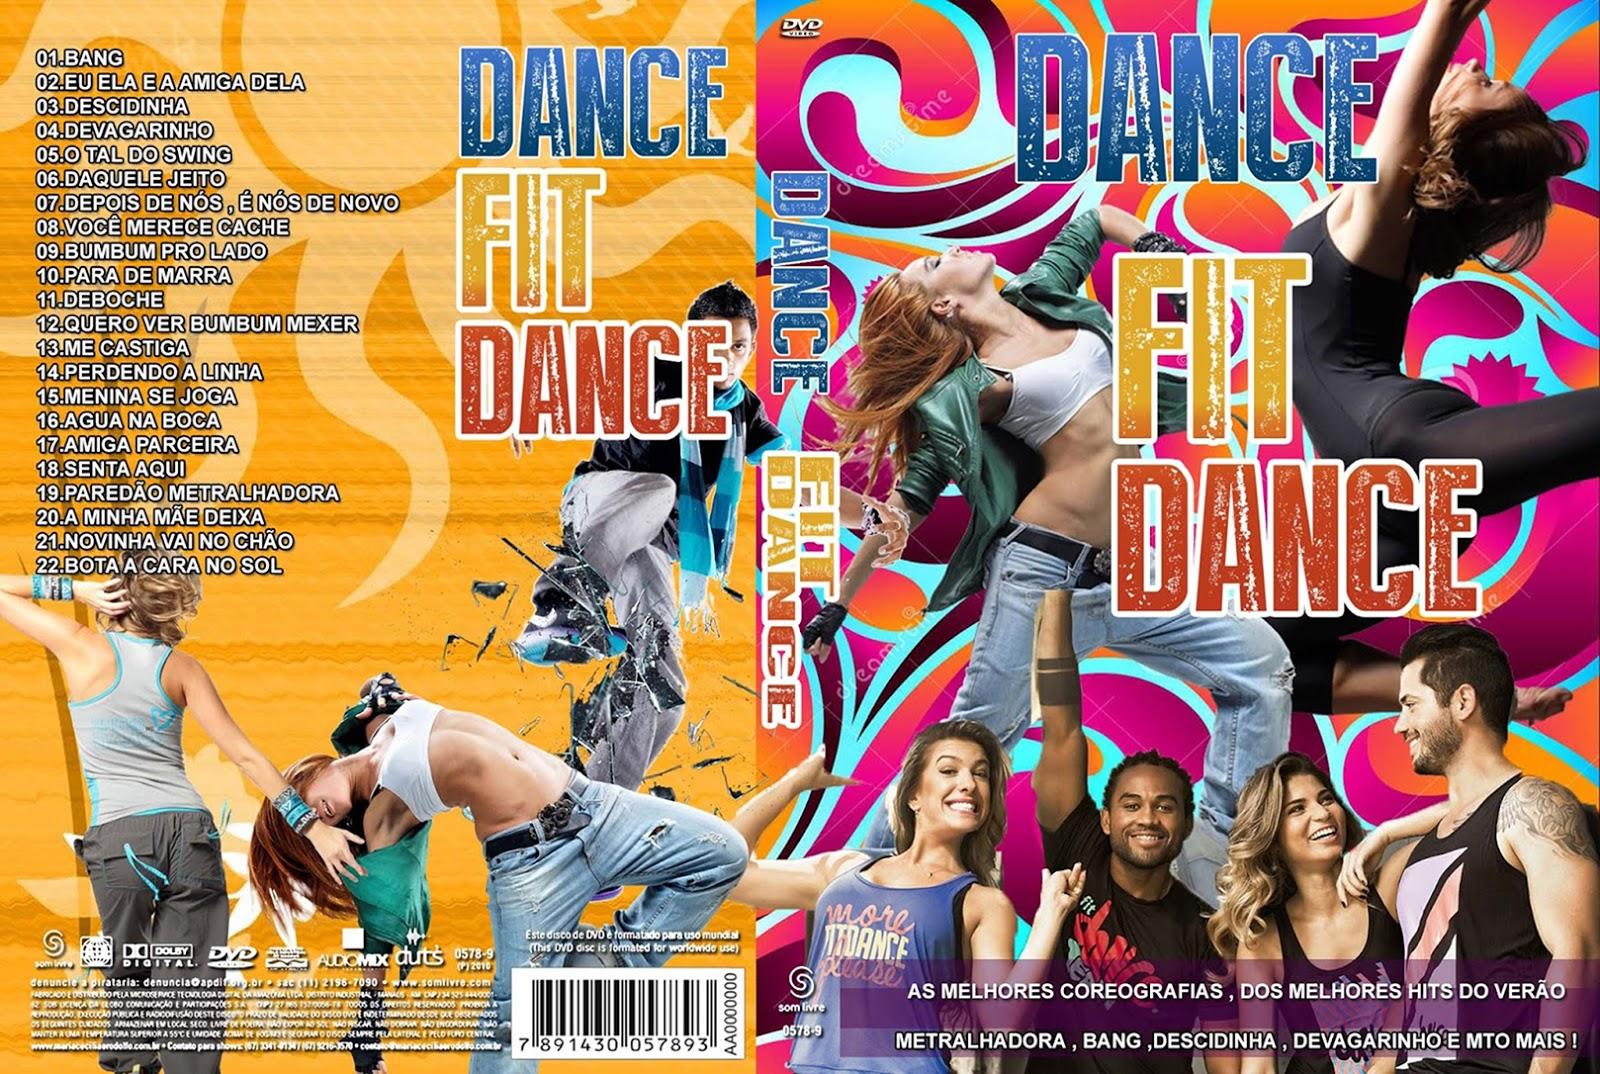 Dance dvd pic 16